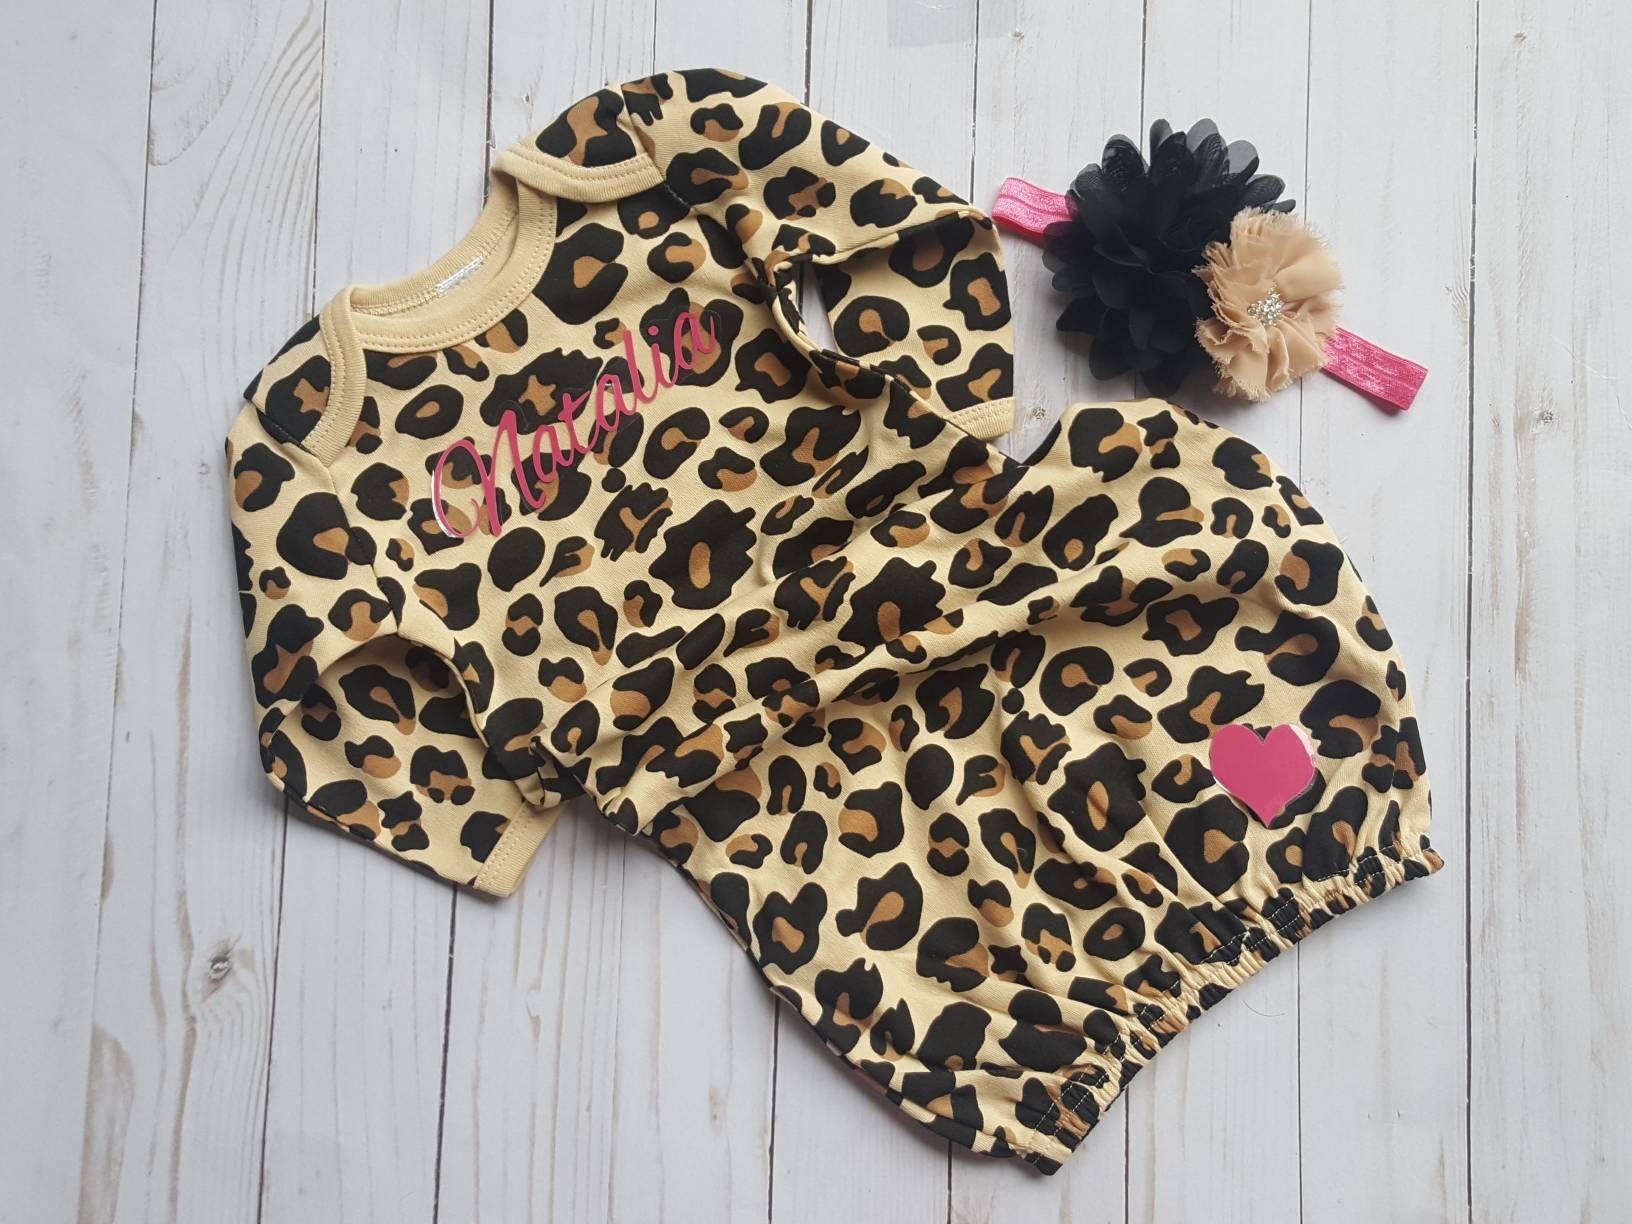 Leopard Newborn Outfit The Best Leopard 2018